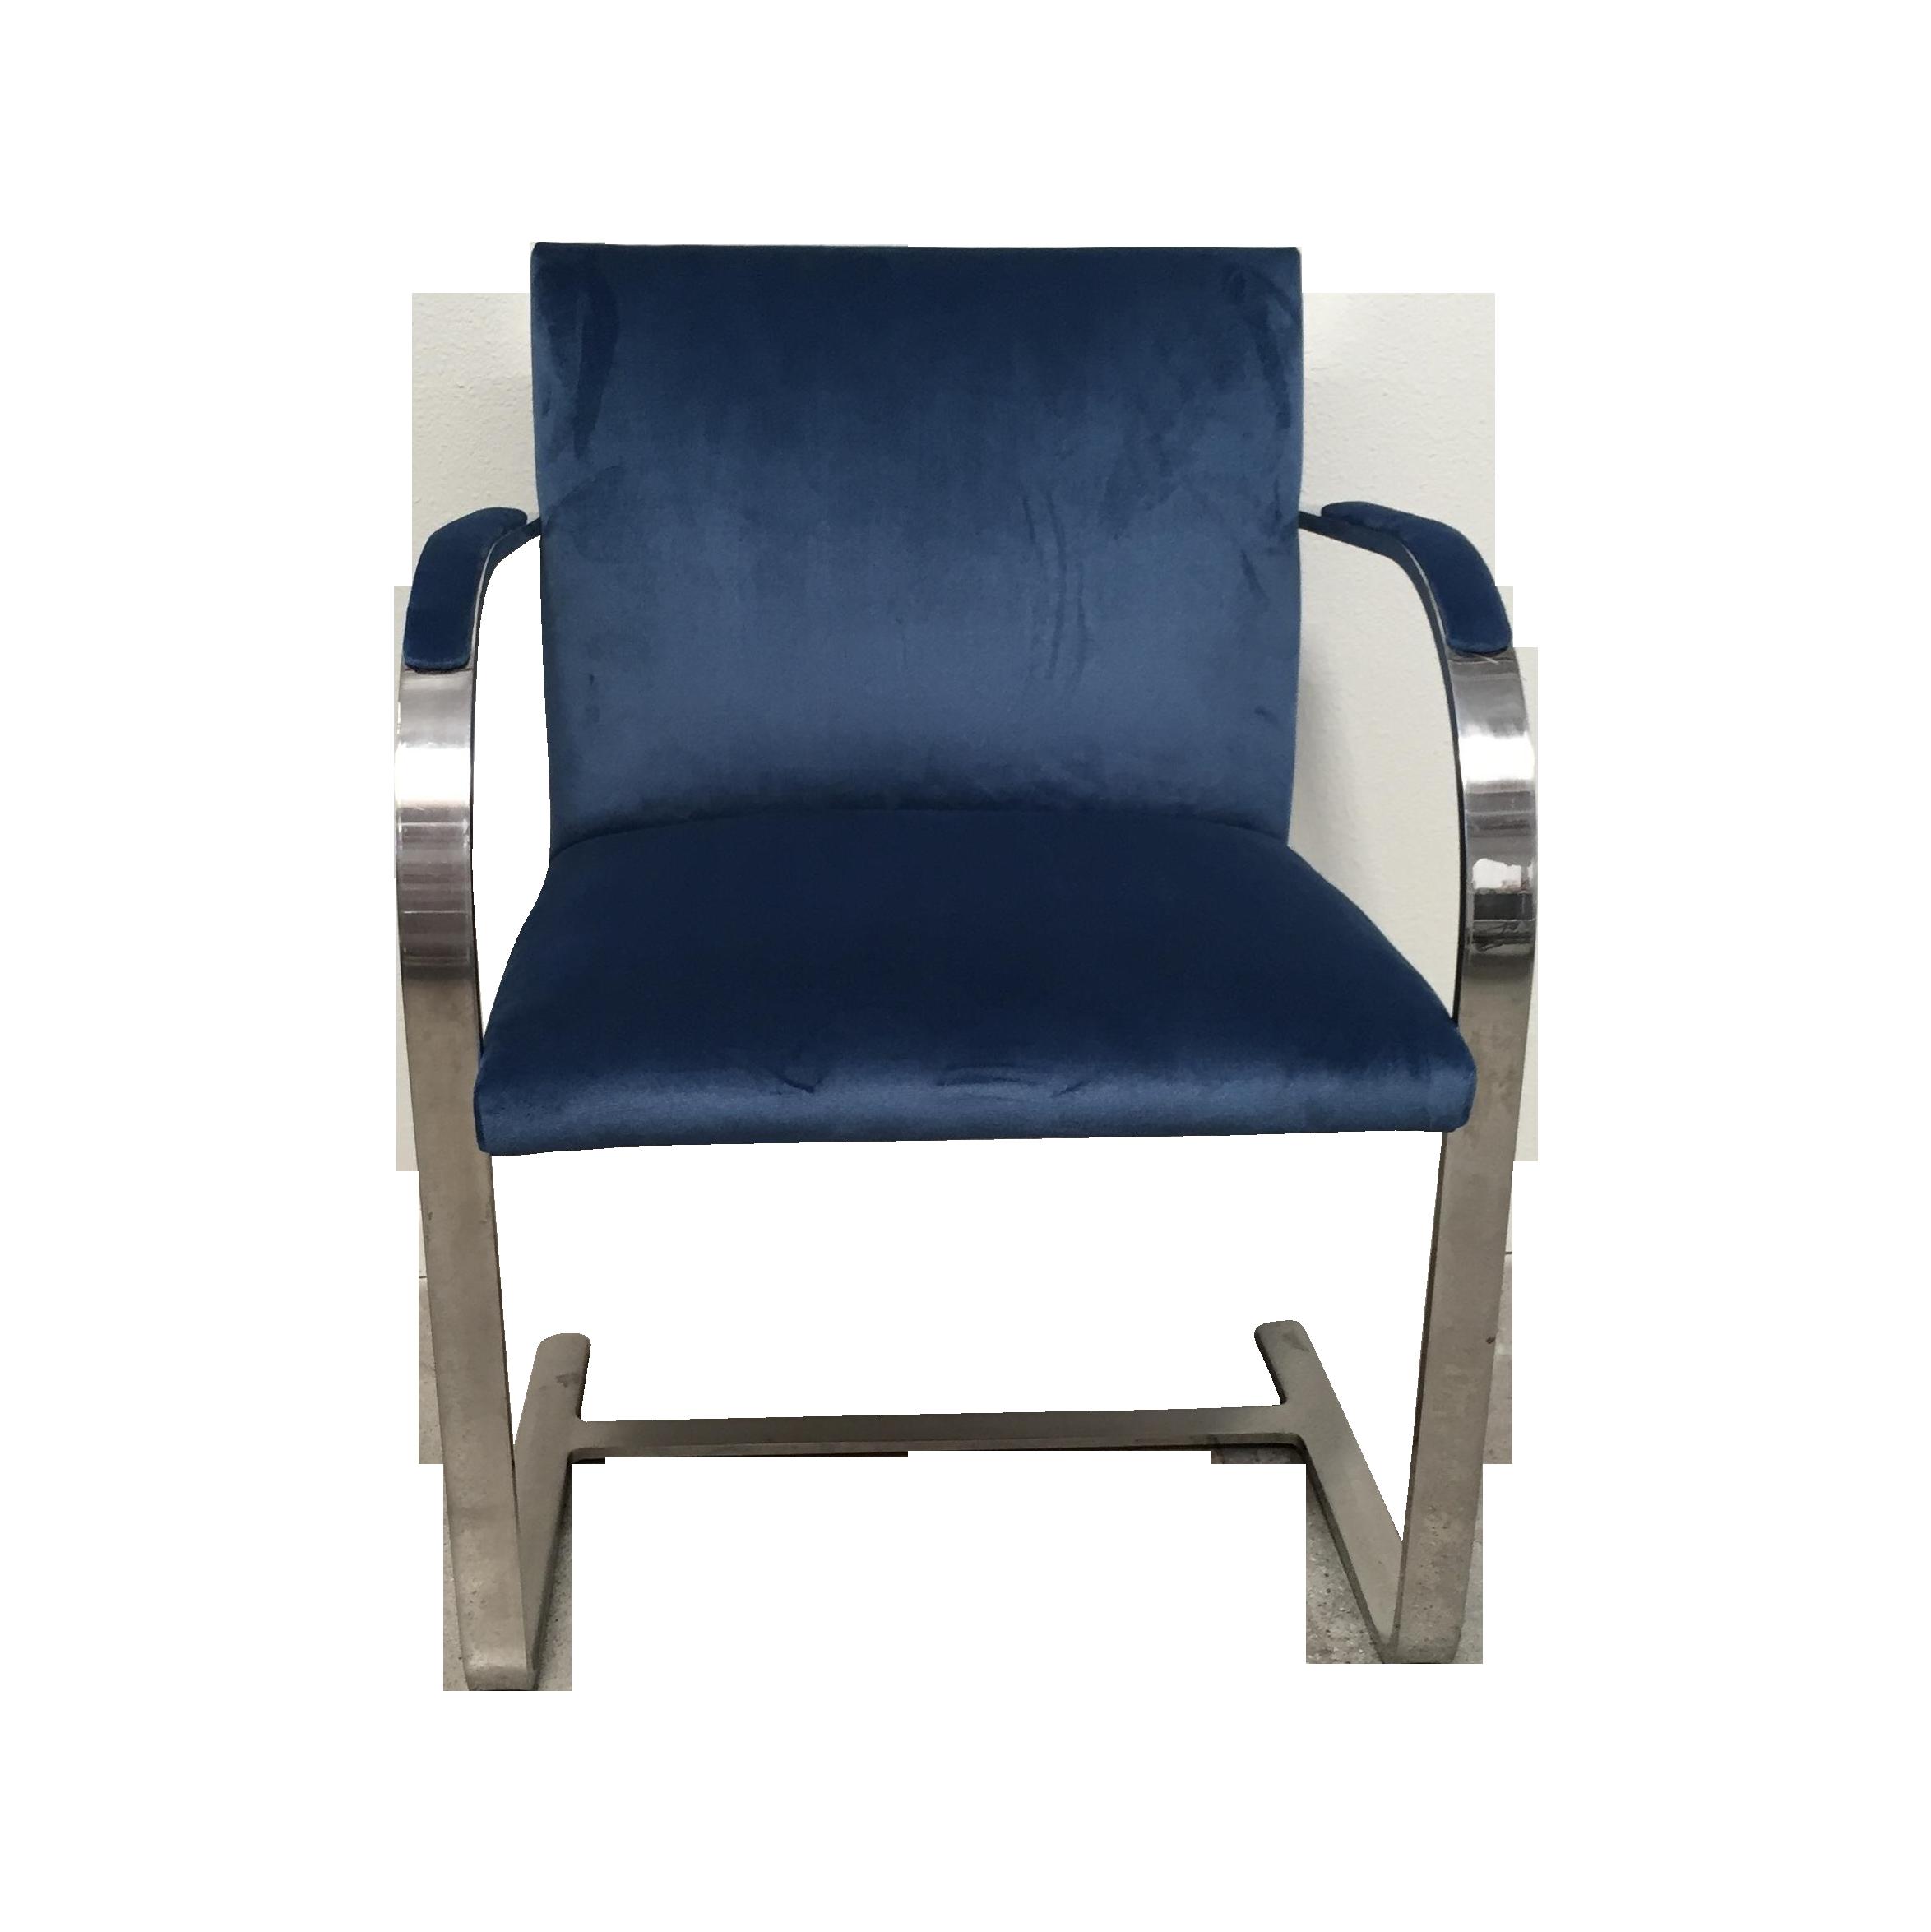 Mies Brno Chair